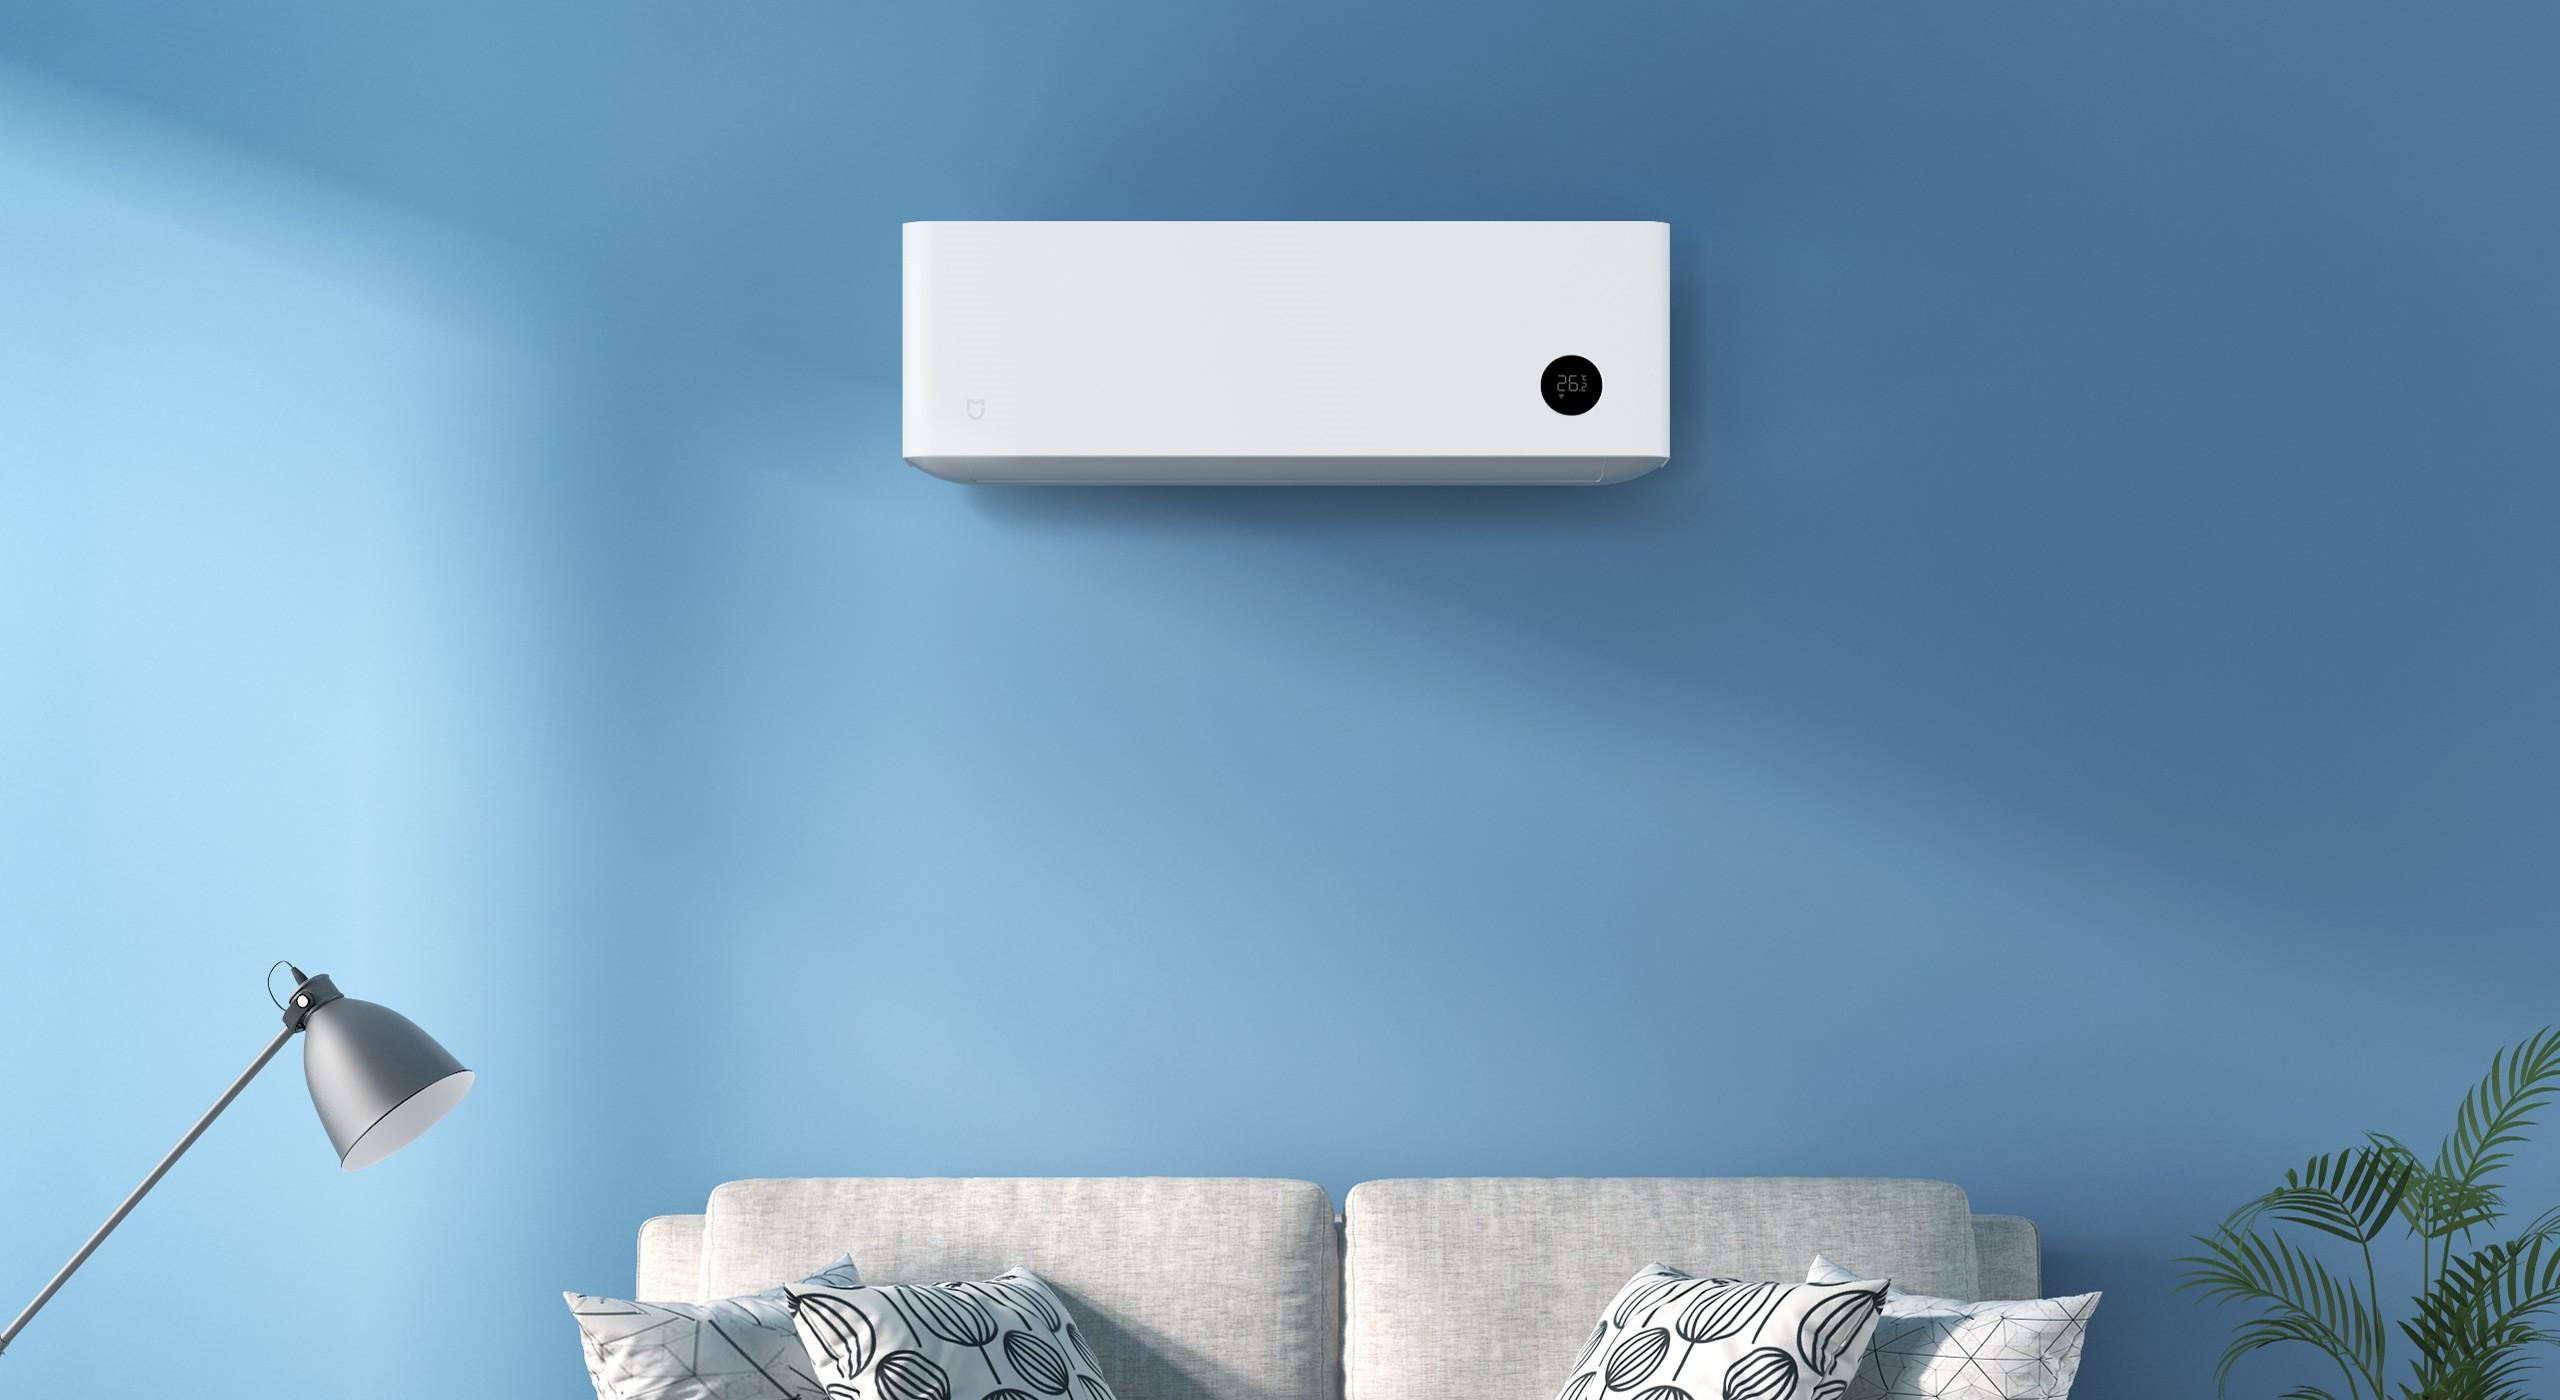 Mijia Smart Air Conditioner —  новый кондиционер компании Xiaomi